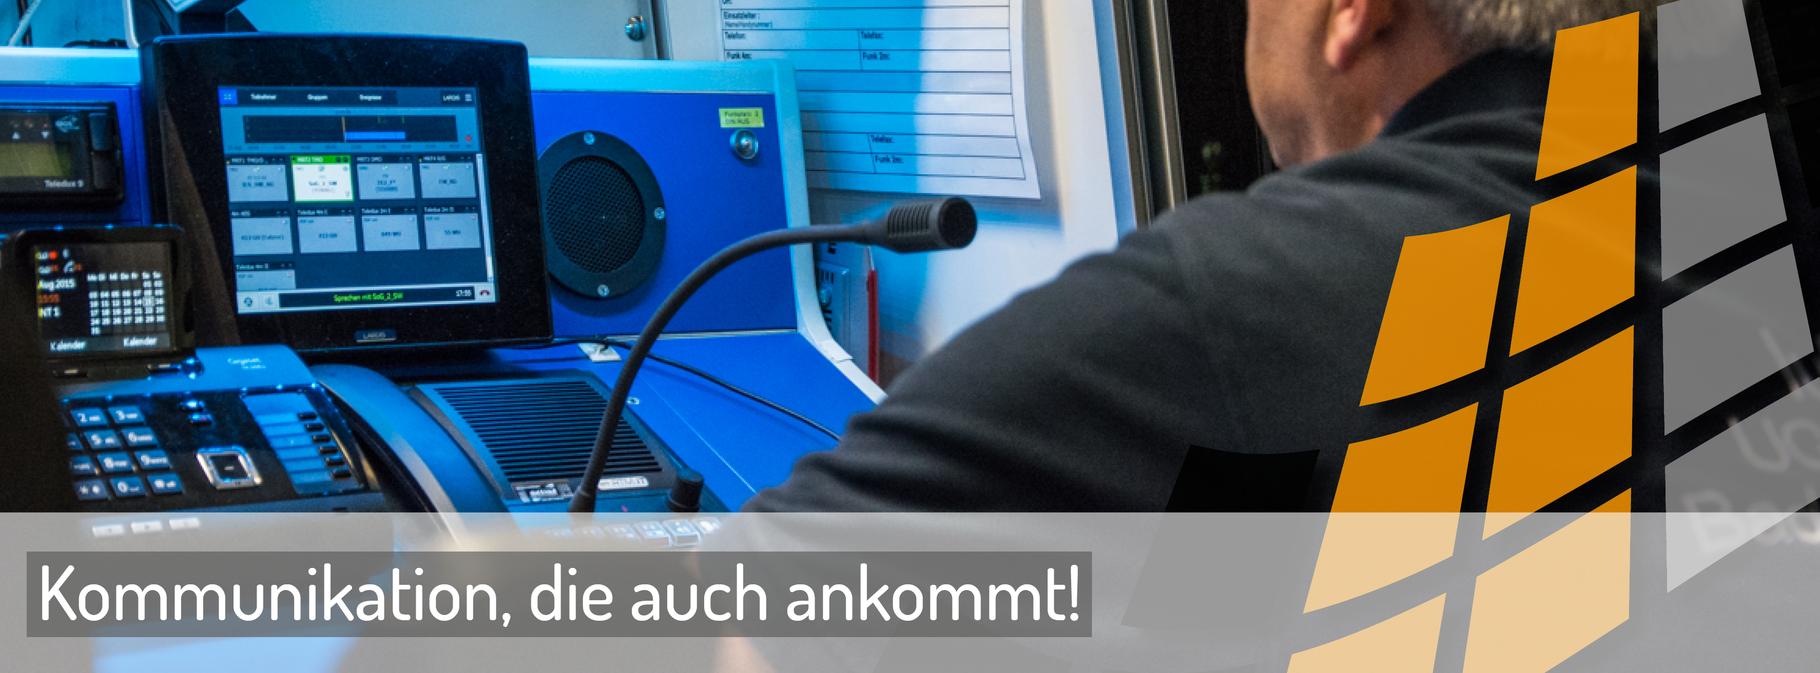 elw-tec  LARDIS DESK  Funkbedienungslösung